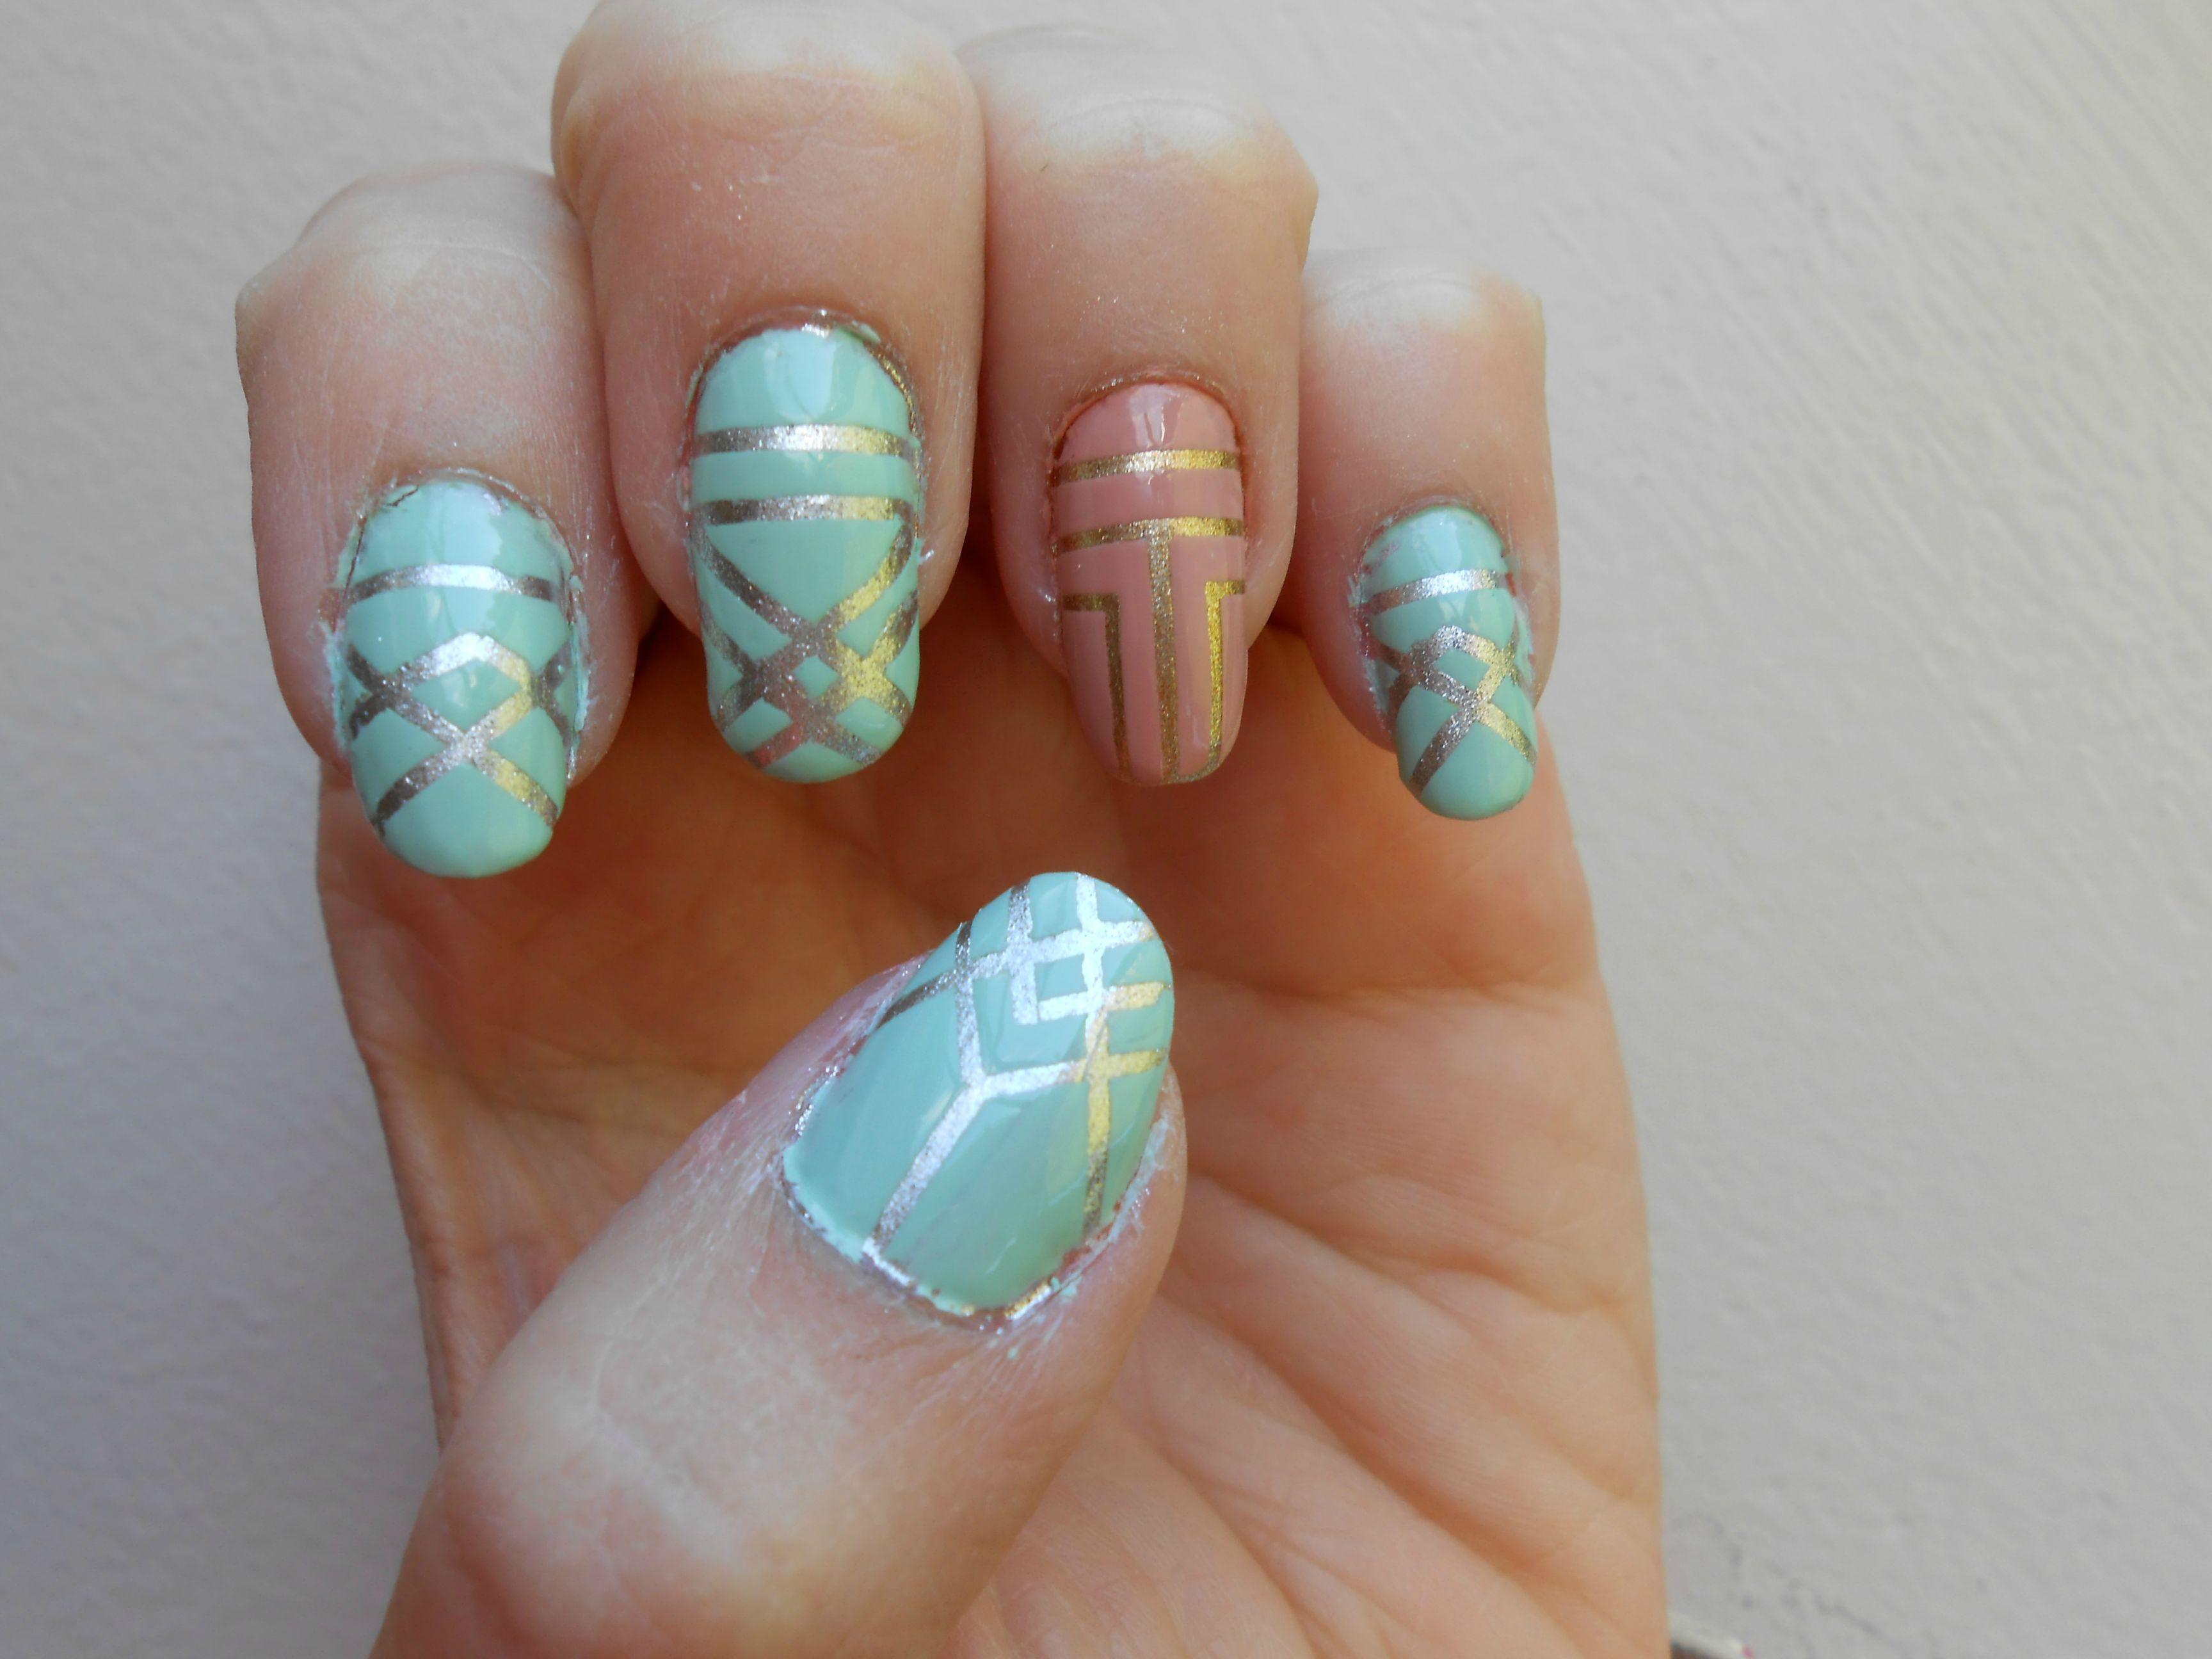 ART DECO INSPIRED NAILS | Skin deep :D | Pinterest | Art deco nails ...